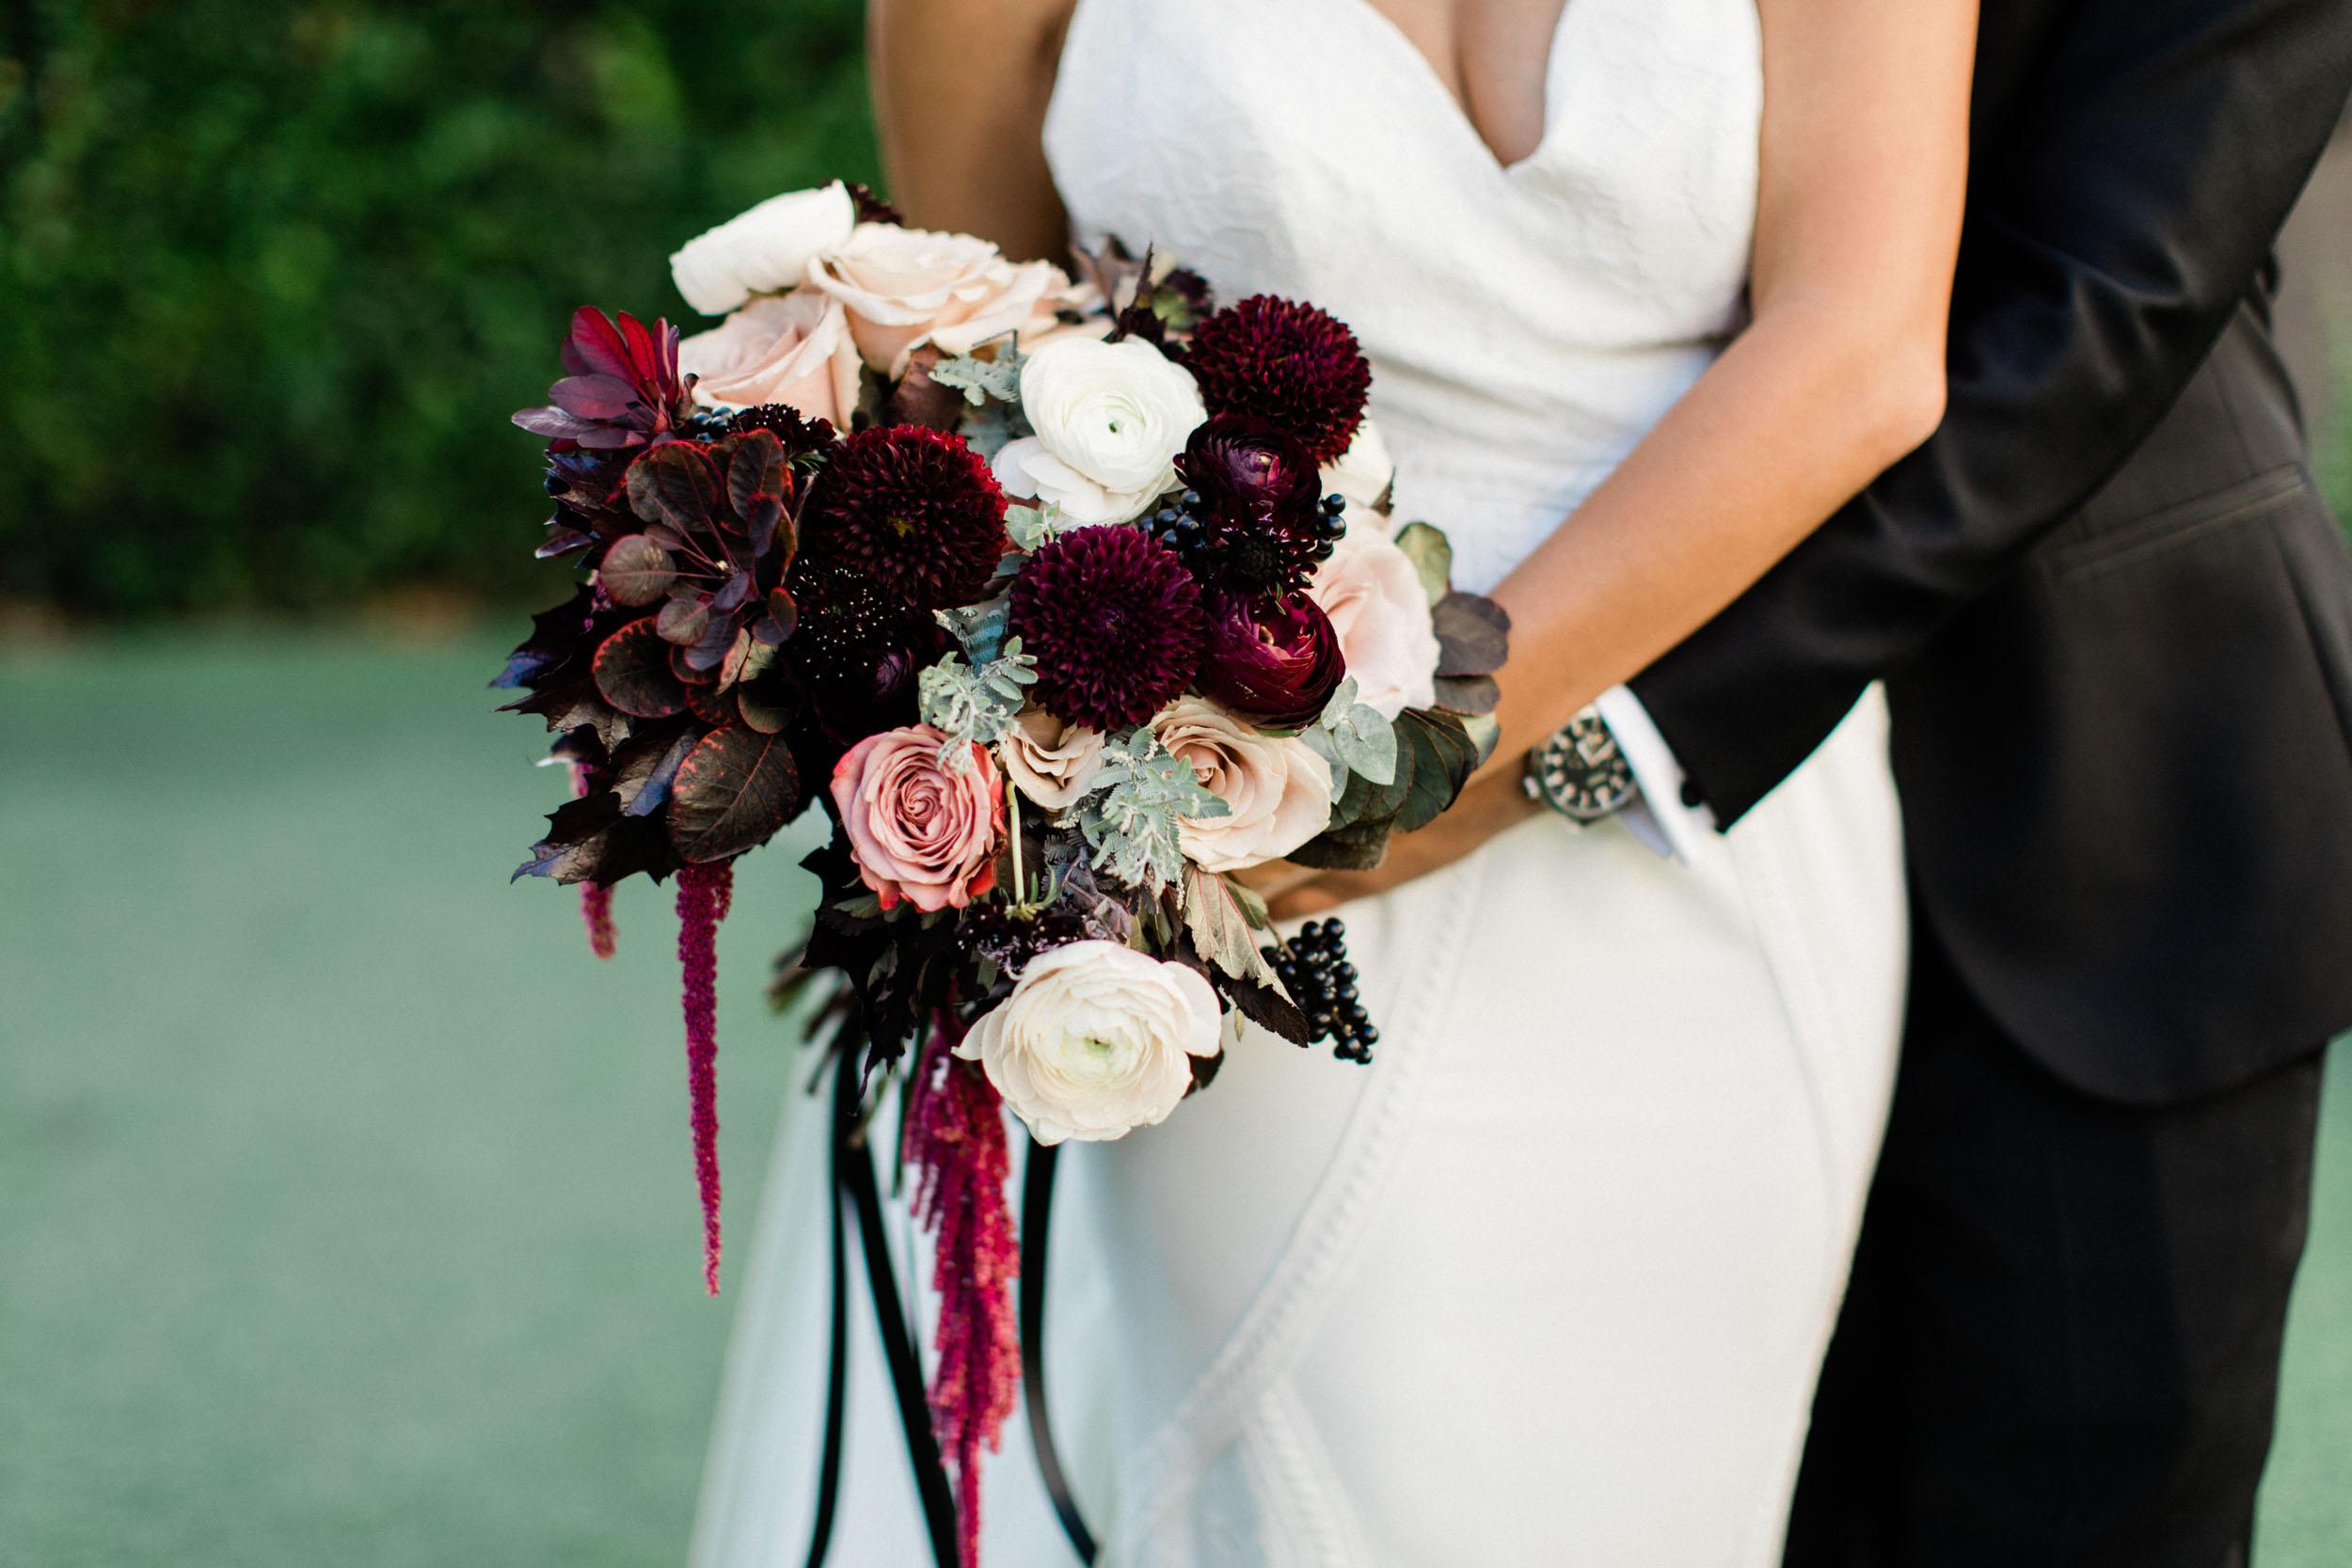 BKM-Photography-Los-Angeles-Highland-Park-York-Manor-Wedding-Photography-0809.jpg